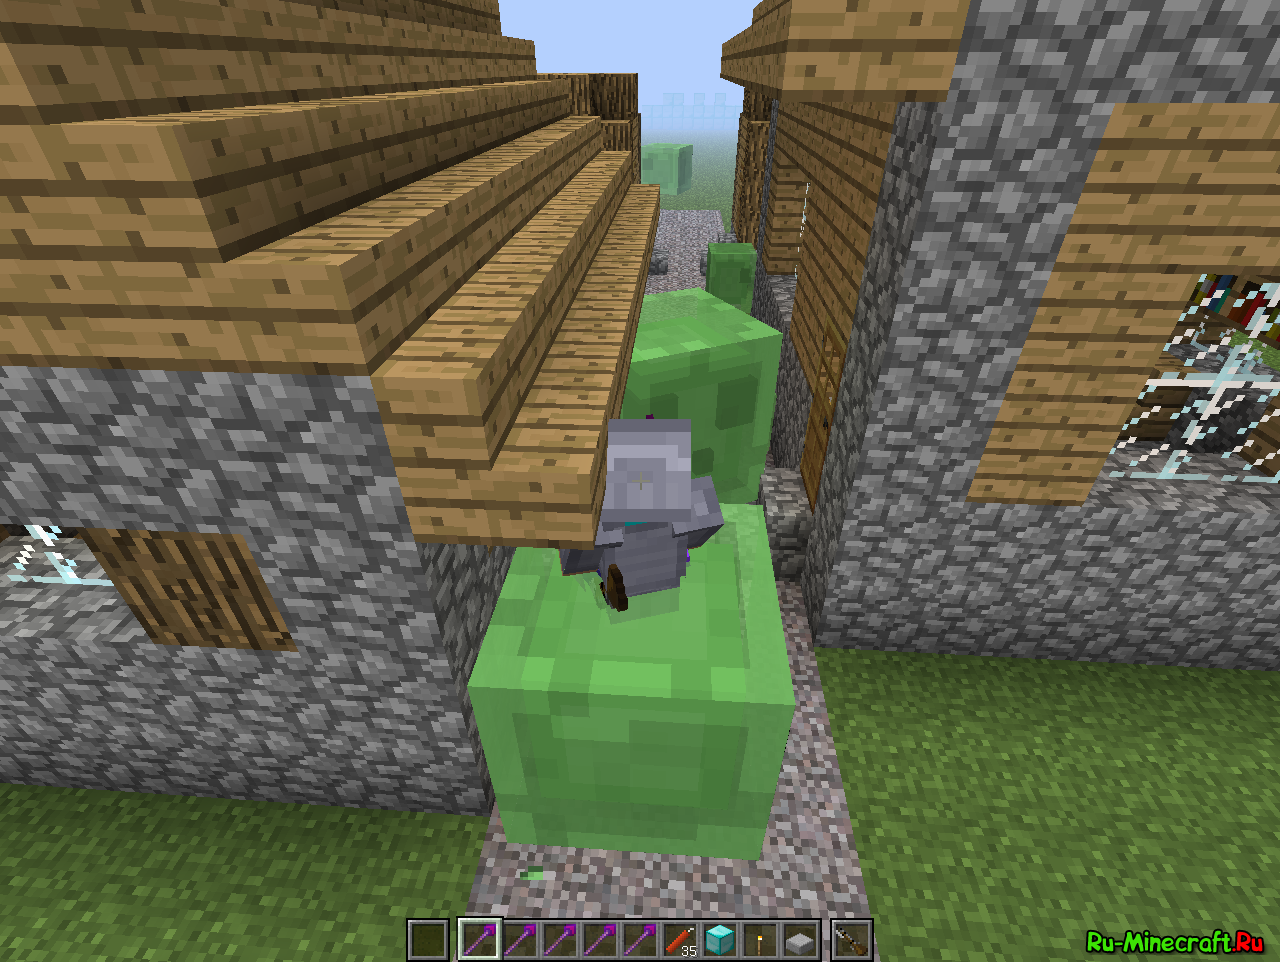 Скачать minecraft 1.5.2 - моды